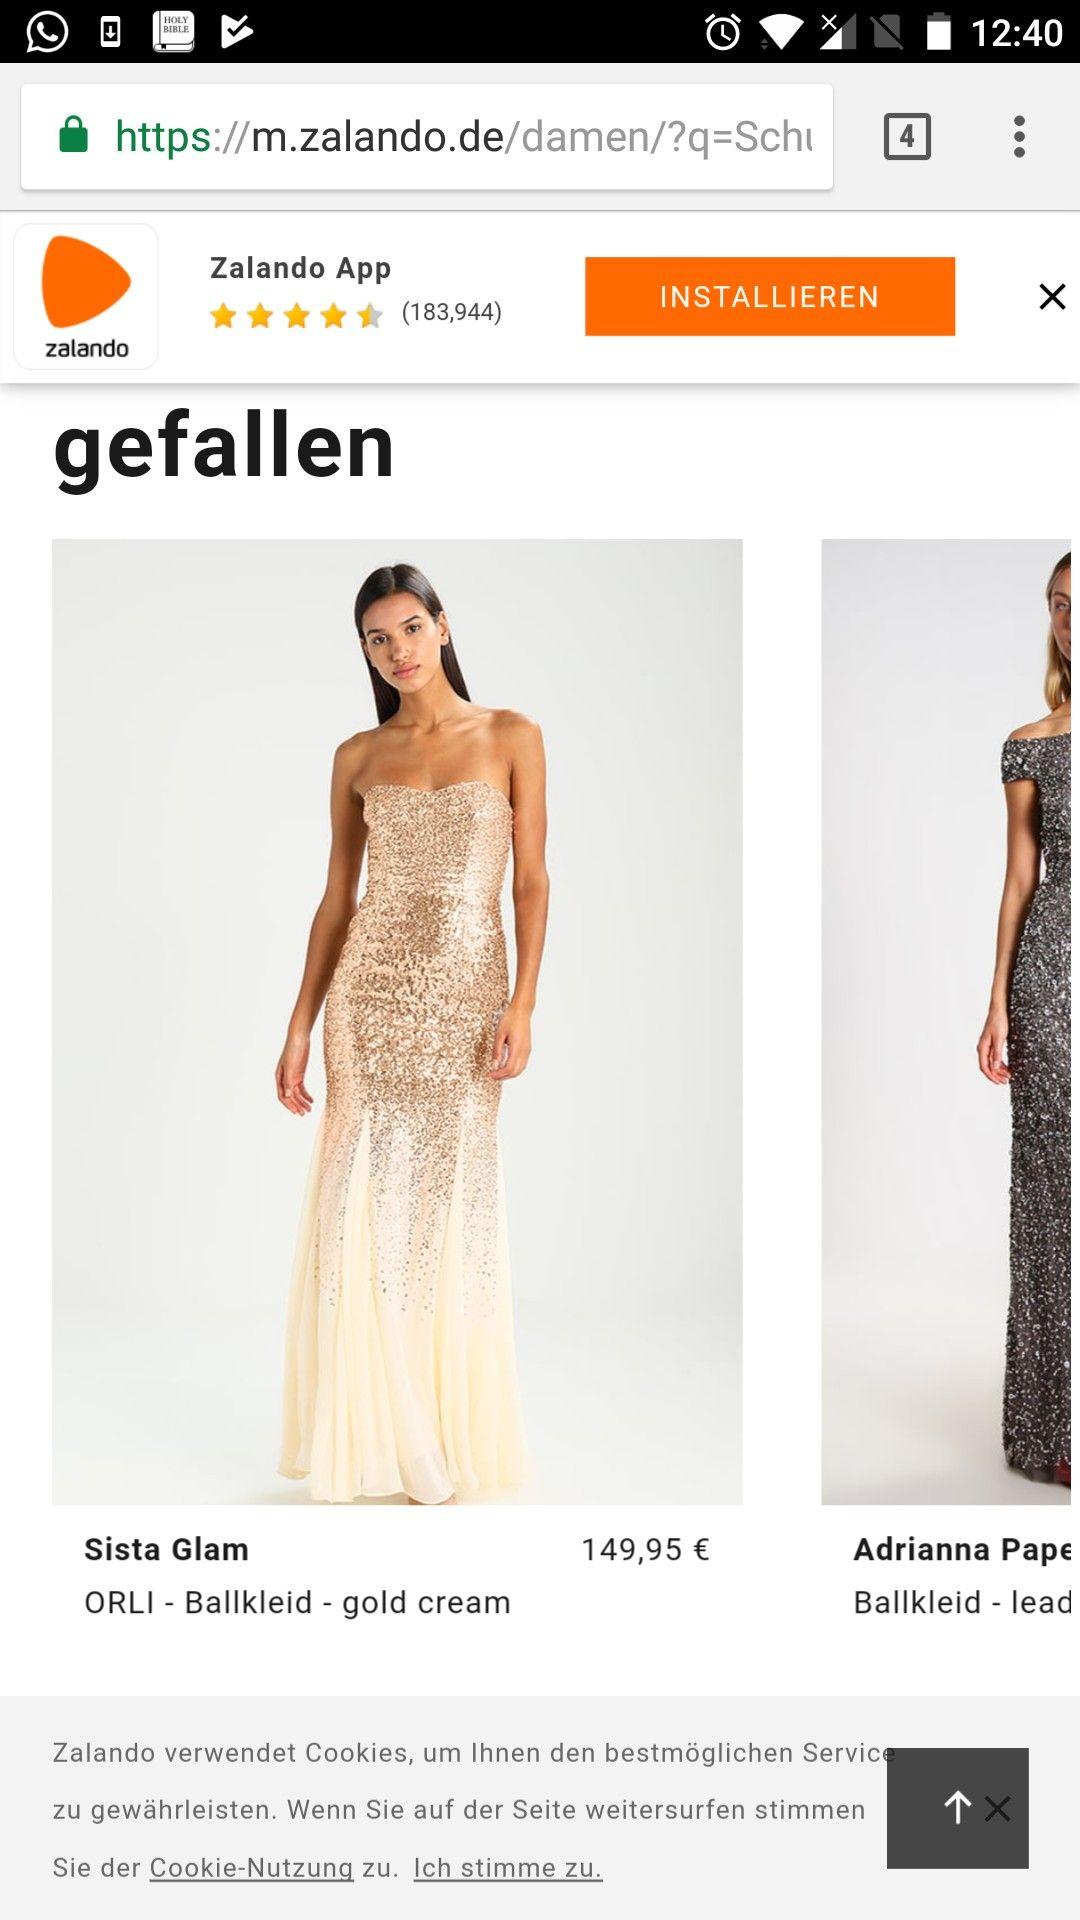 pinsusanne klassen on kleider | prom dresses, dresses